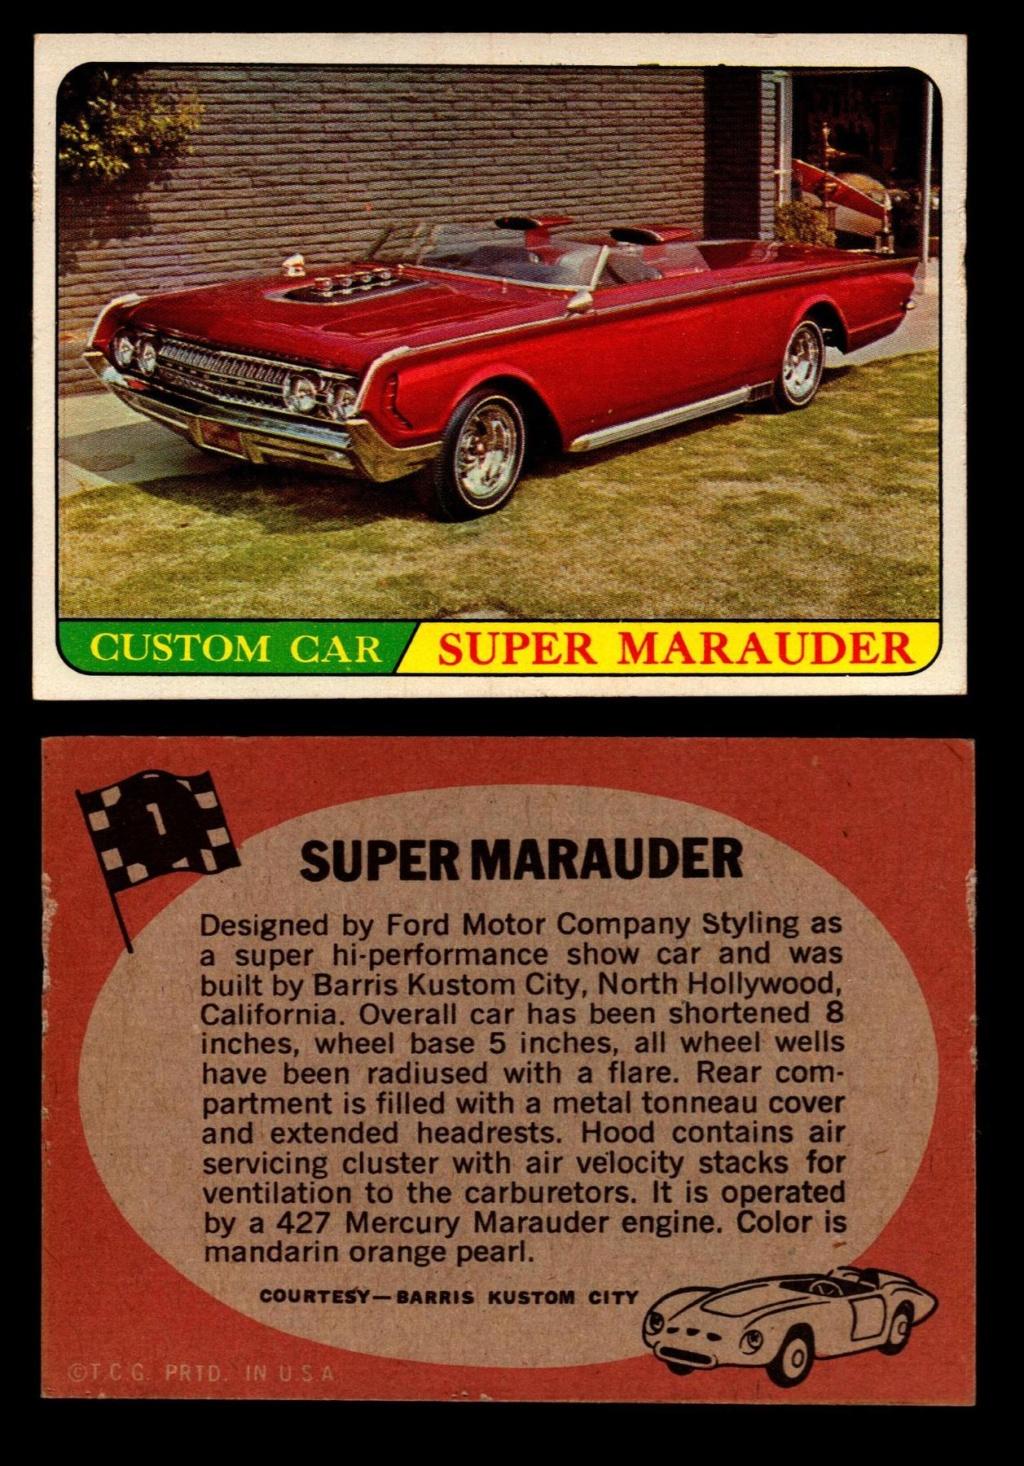 Hot Rods Topps - Vintage Trading Cards 1968 - Custom car - Dragster - Racer - Dream car - Barris Kustom City - Ed Roth Darrill Starbird, Gene Winfield, Bill Cuchenberry 1_236512